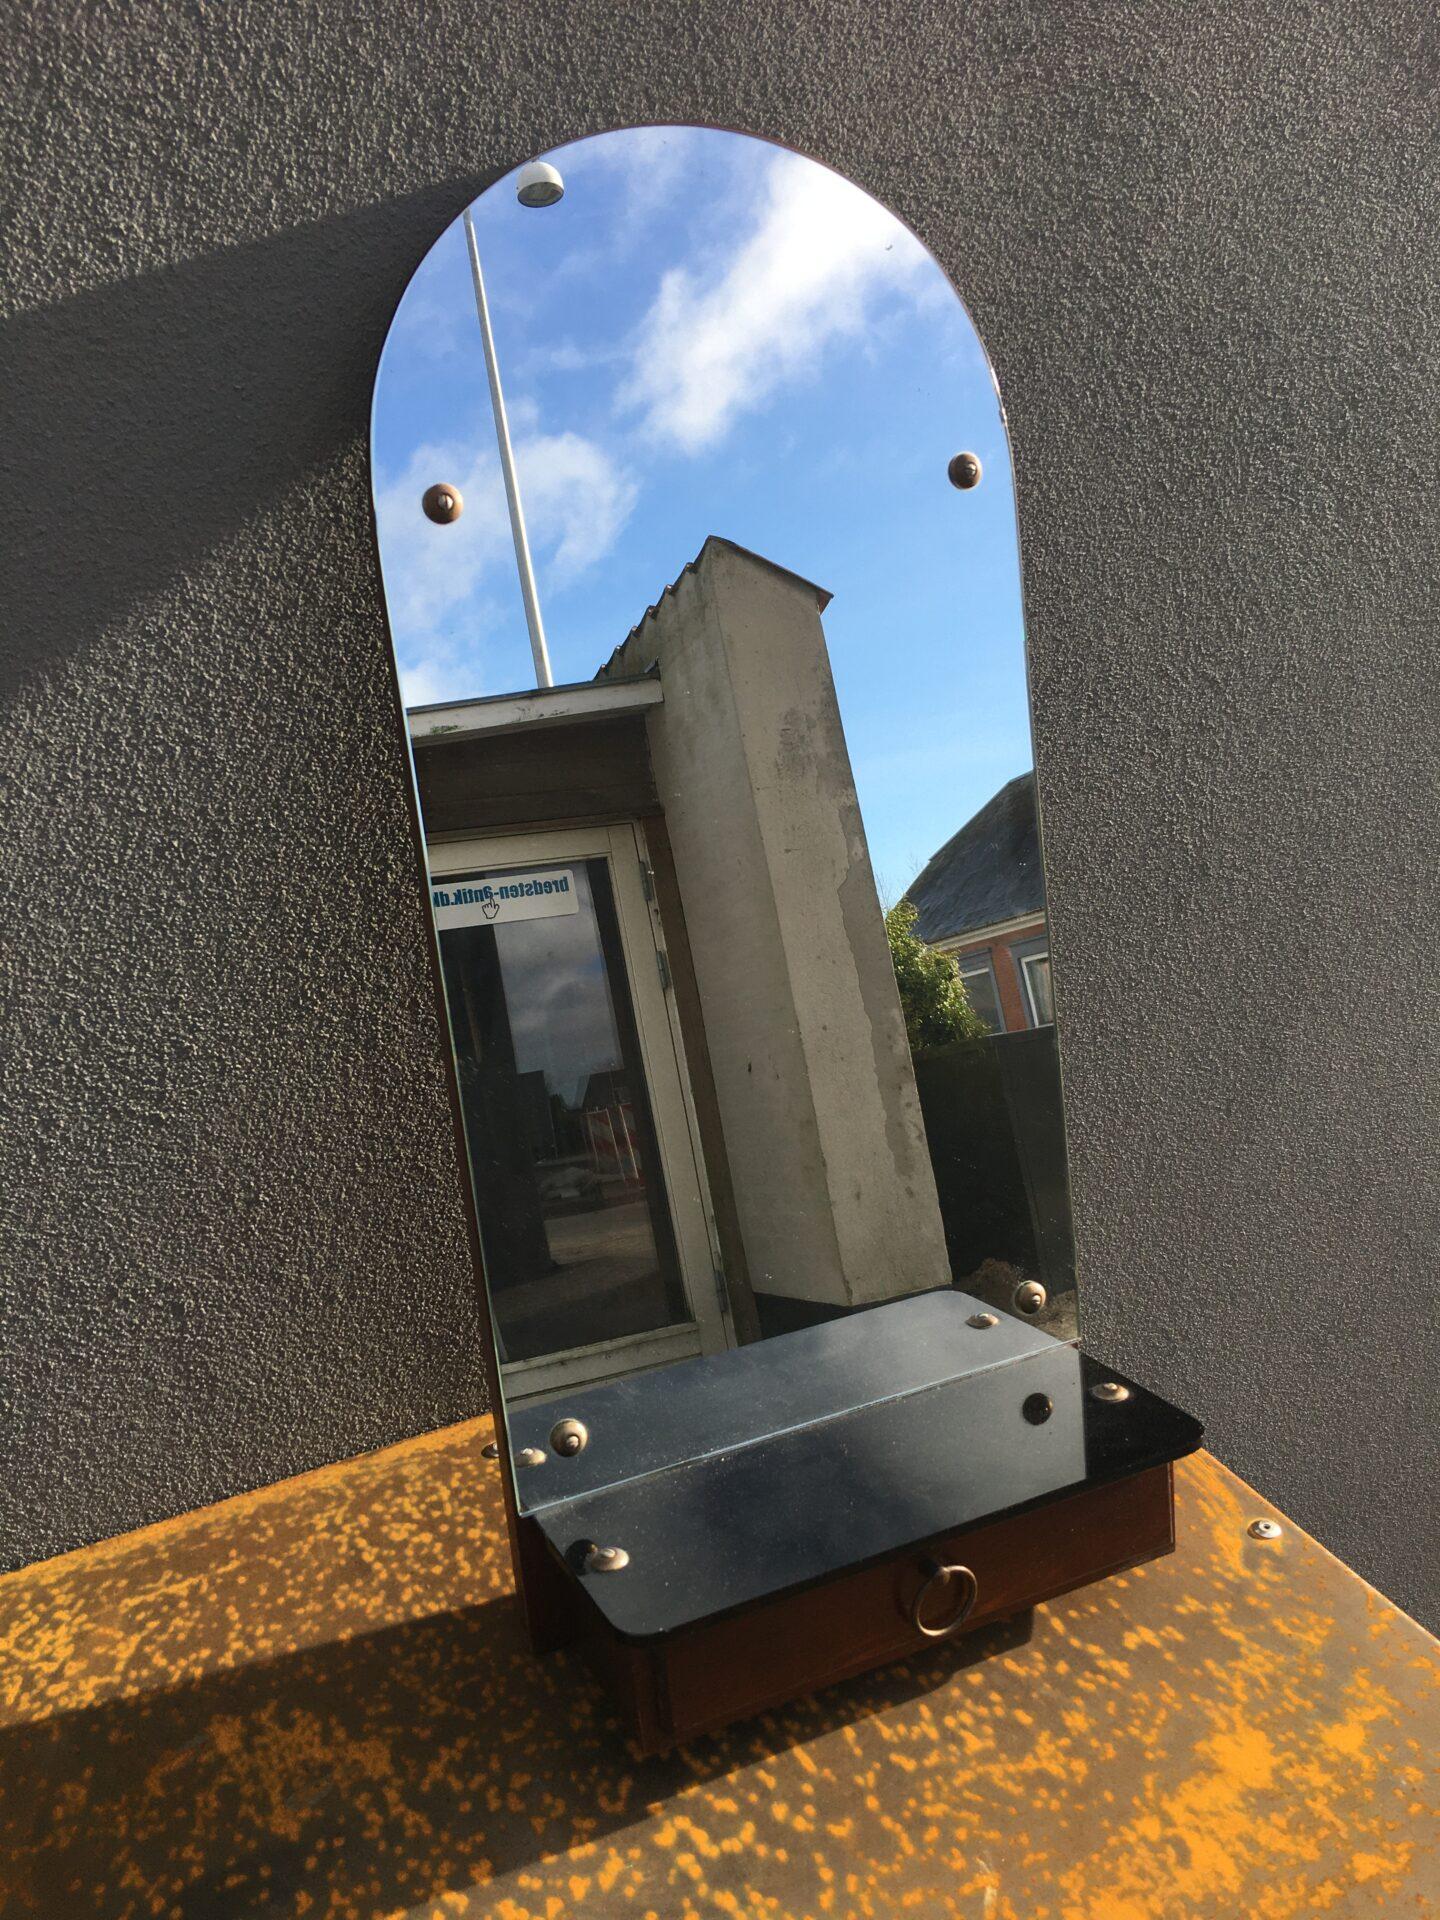 Retro spejl med glashylde og skuffe, ca 1950, h = 70 cm, pris 300 kr